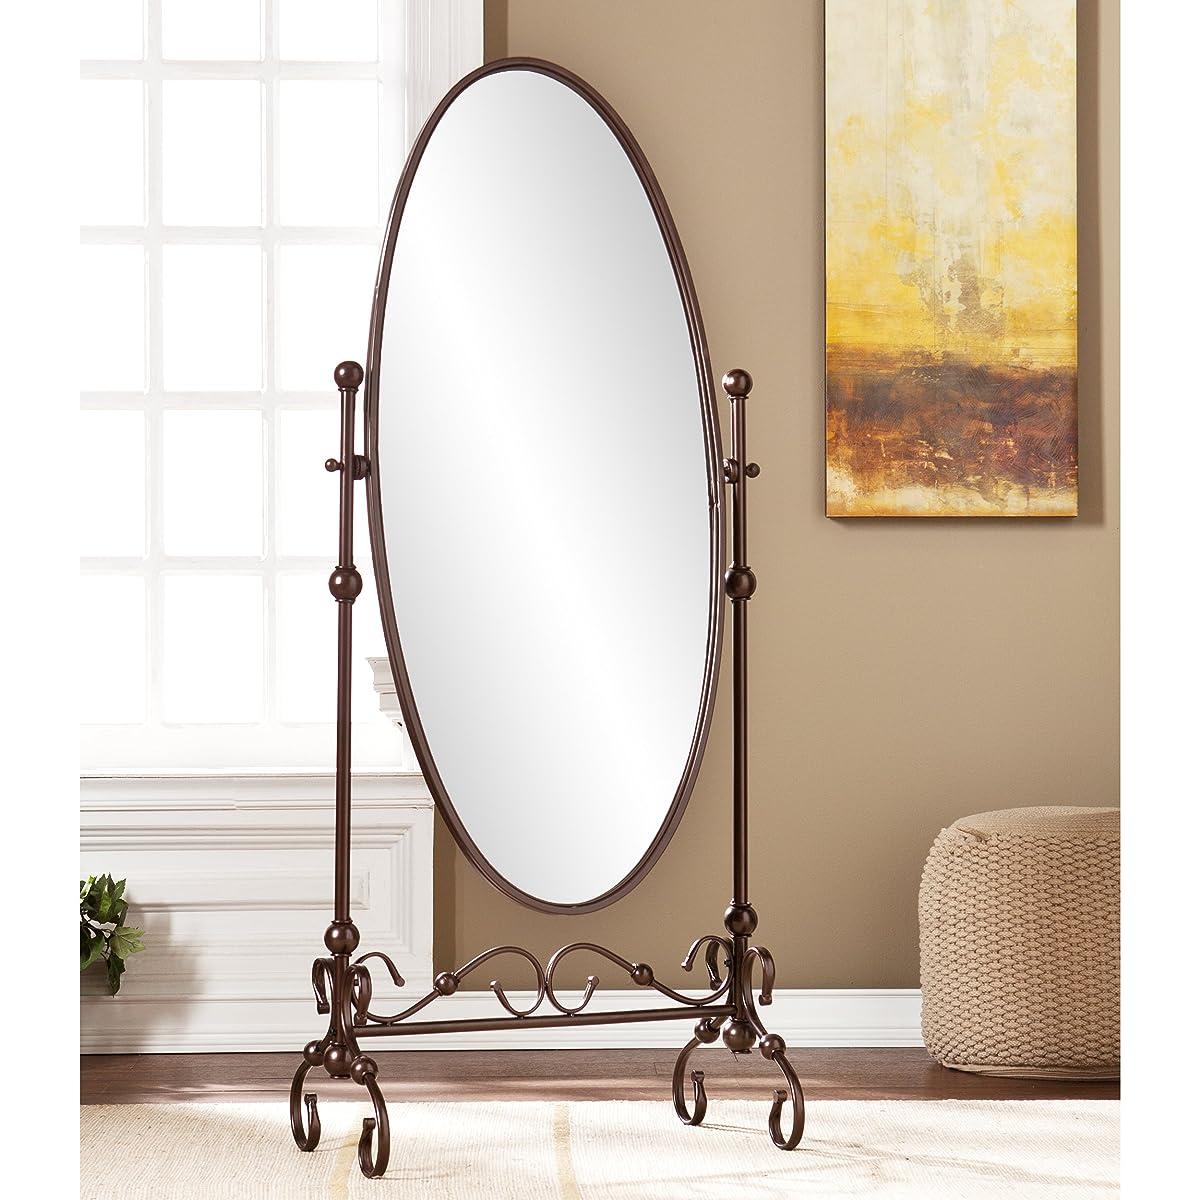 "Southern Enterprises Lourdes Cheval Oval Free Standing Mirror 56"", Antique Bronze Finish"